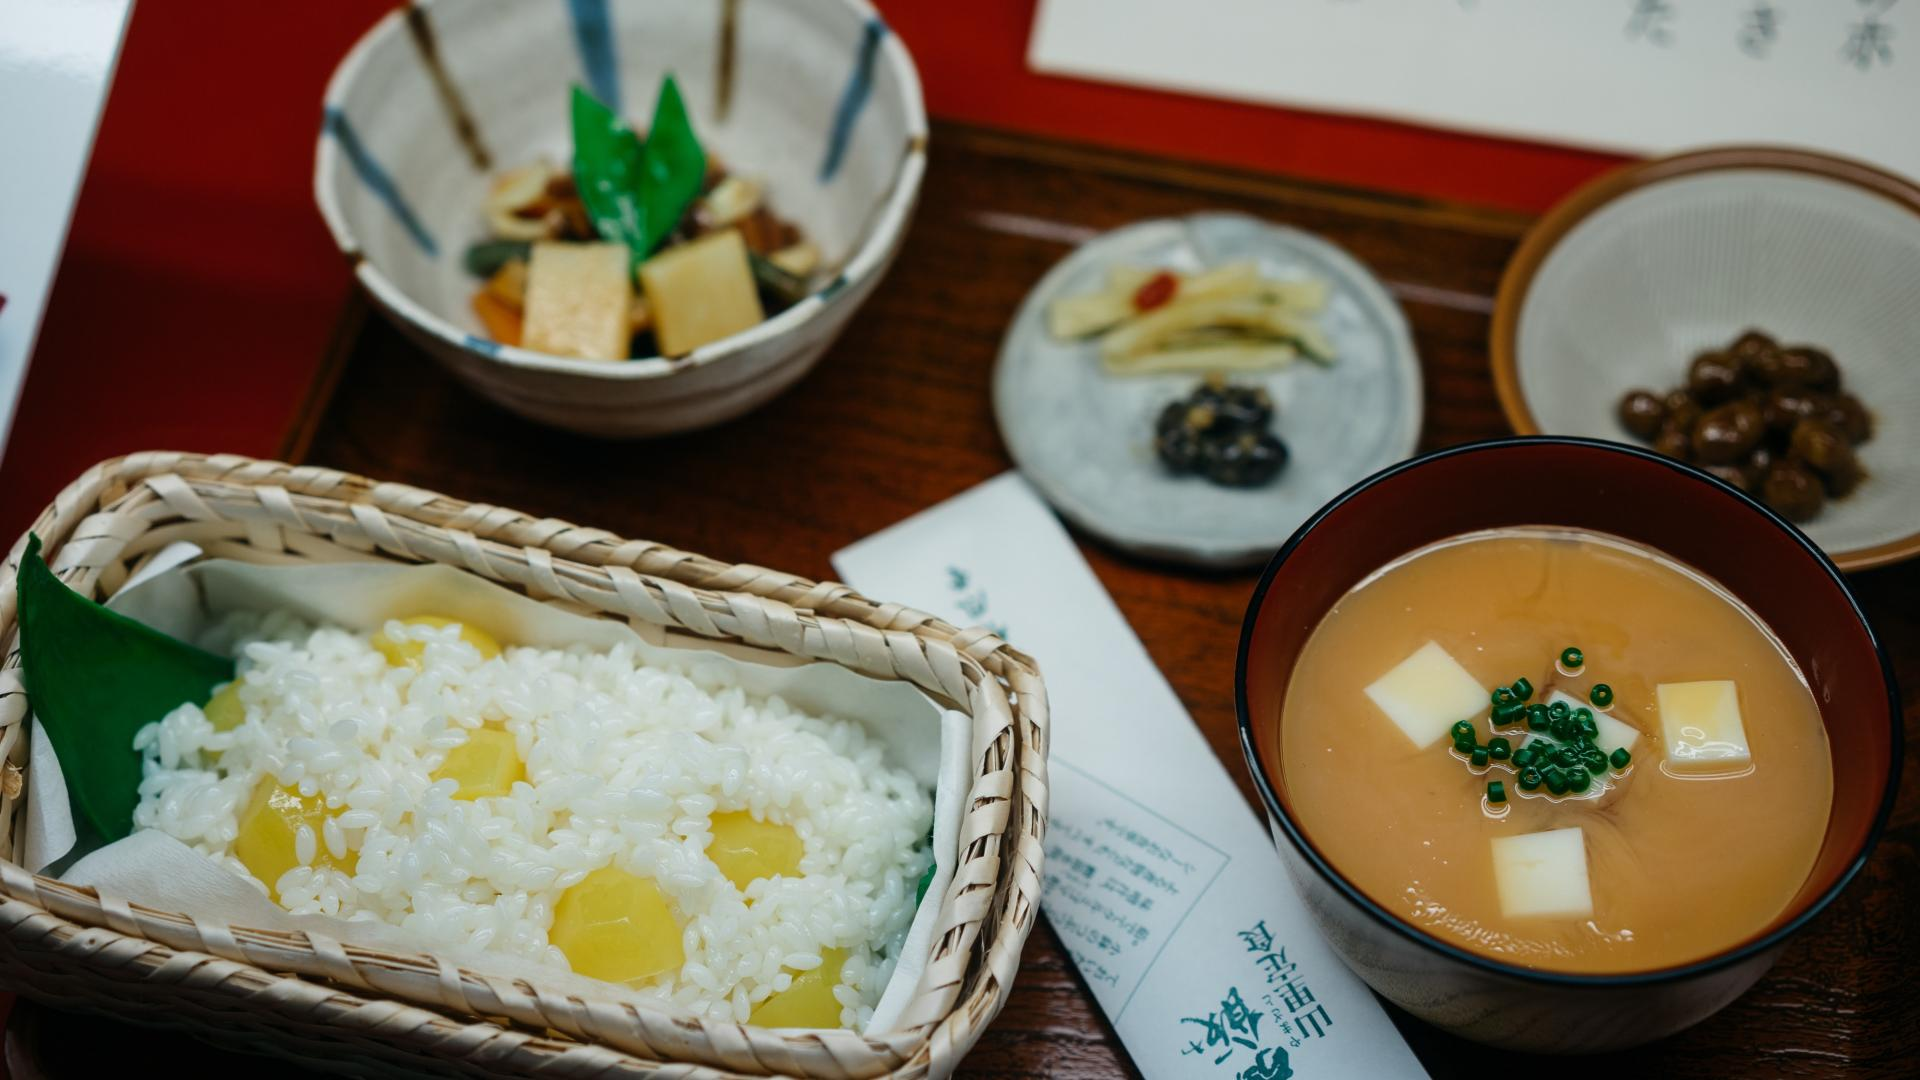 japanische Küche, Japan, japanische Mahlzeit, japanische Ernährung